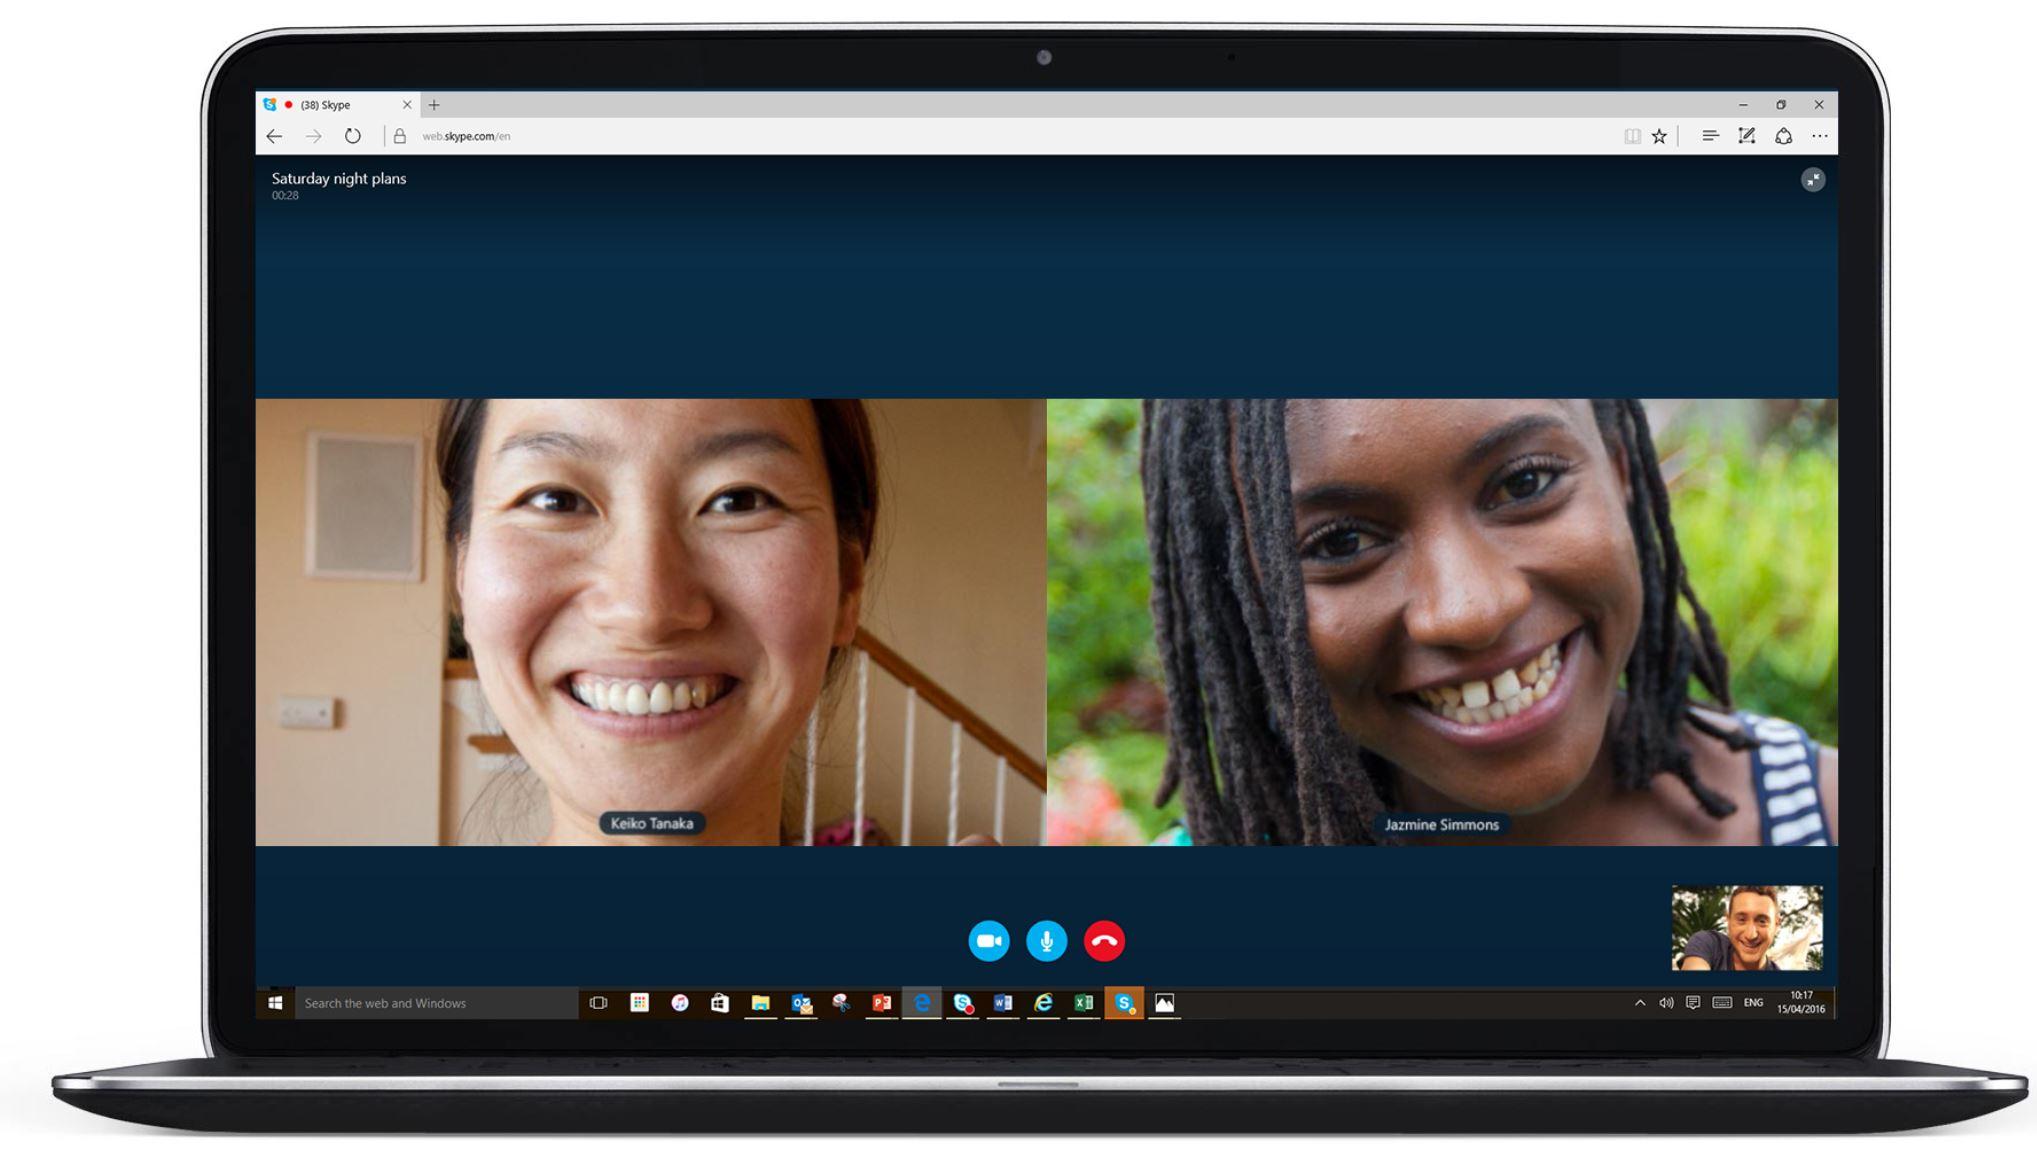 skype-video-calling-on-microsoft-edge1 (1)